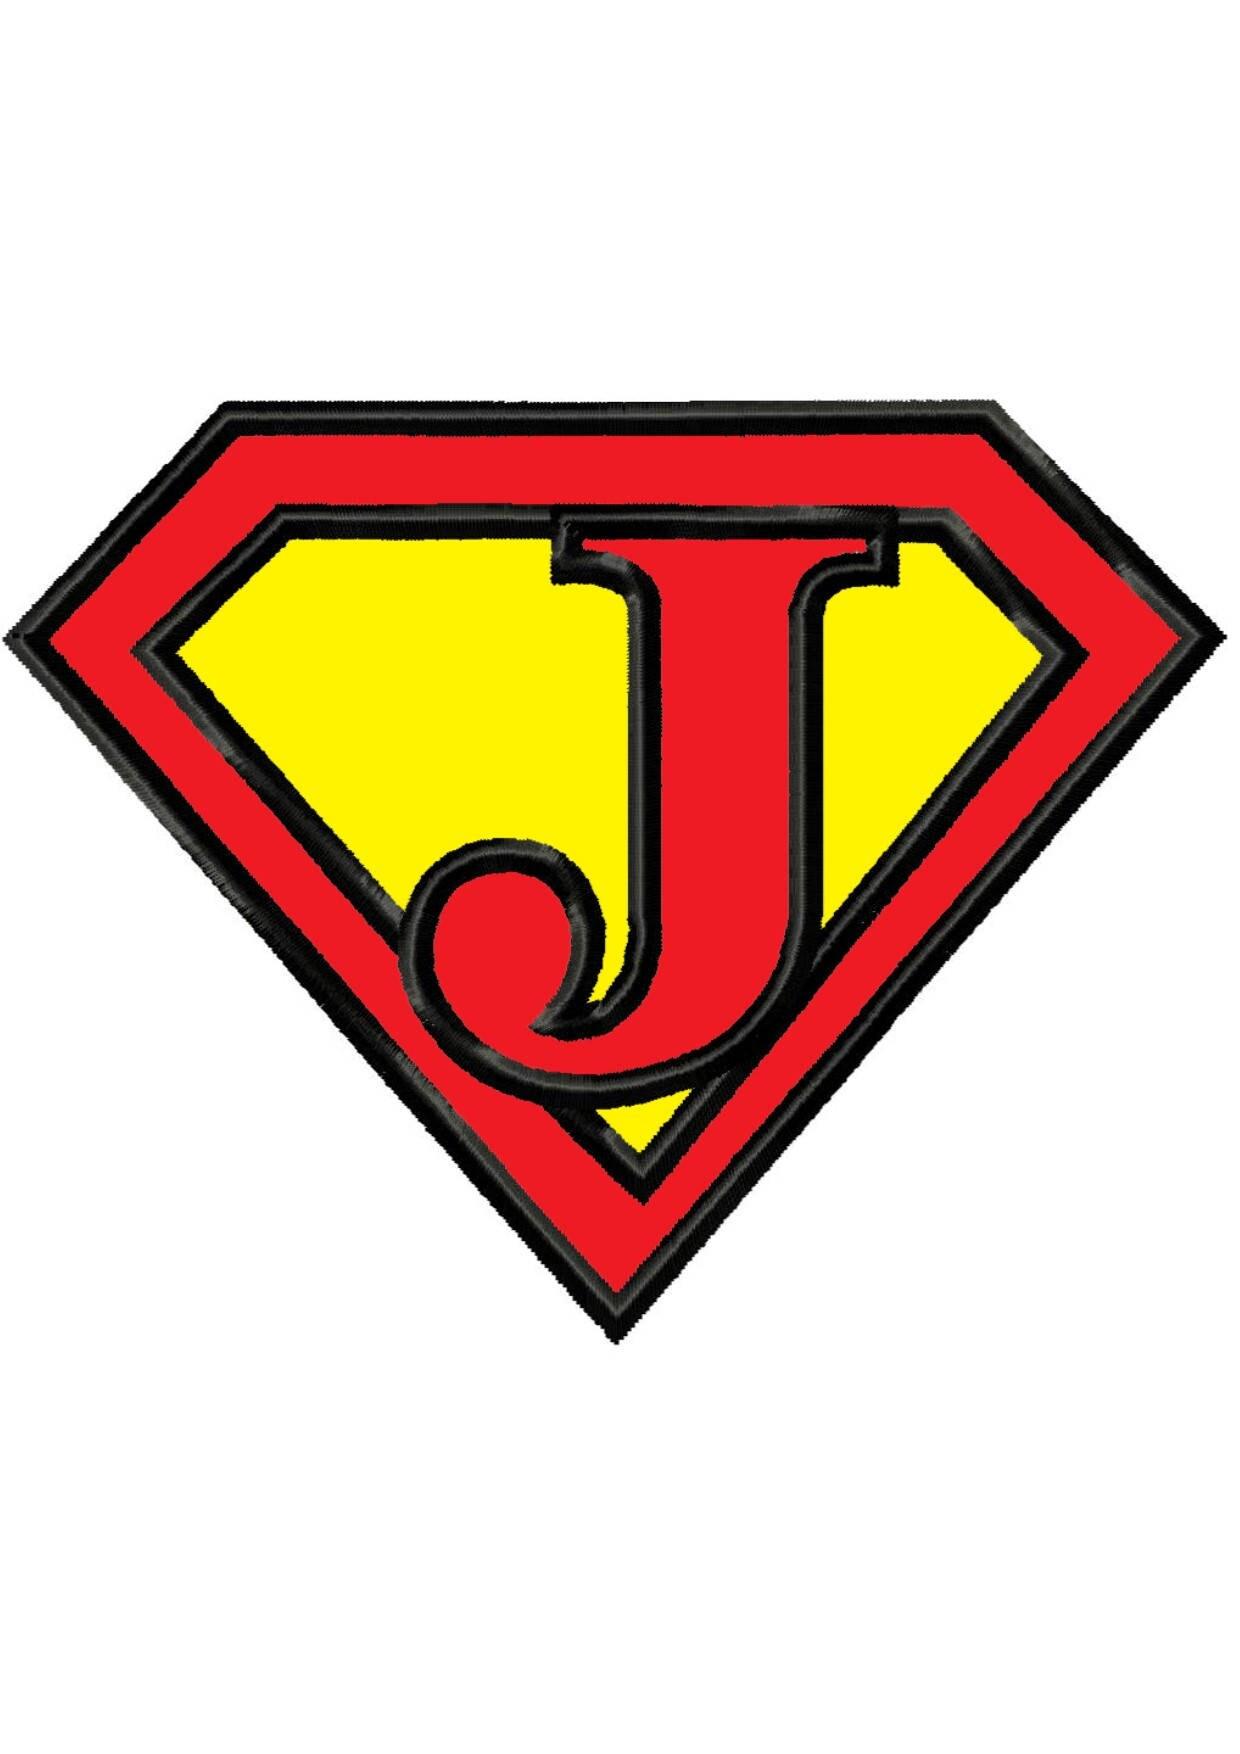 superman letter - People.davidjoel.co